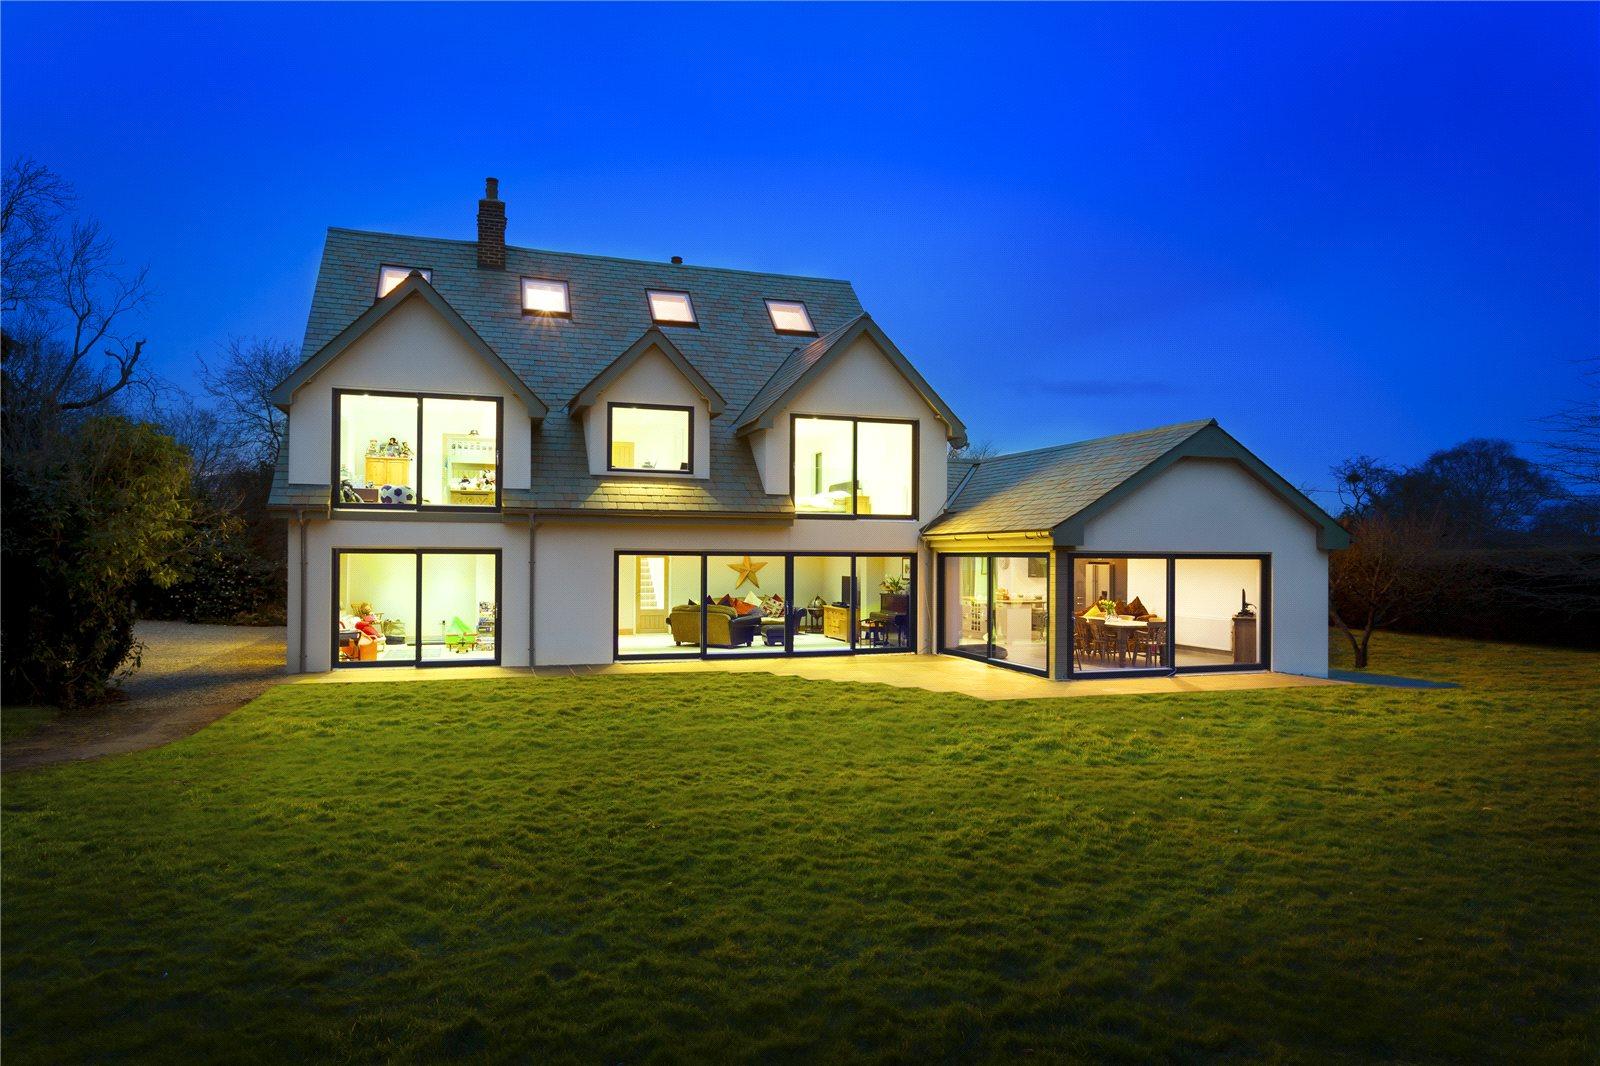 Villa per Vendita alle ore Canterbury Road, Challock, Ashford, Kent, TN25 Ashford, Inghilterra